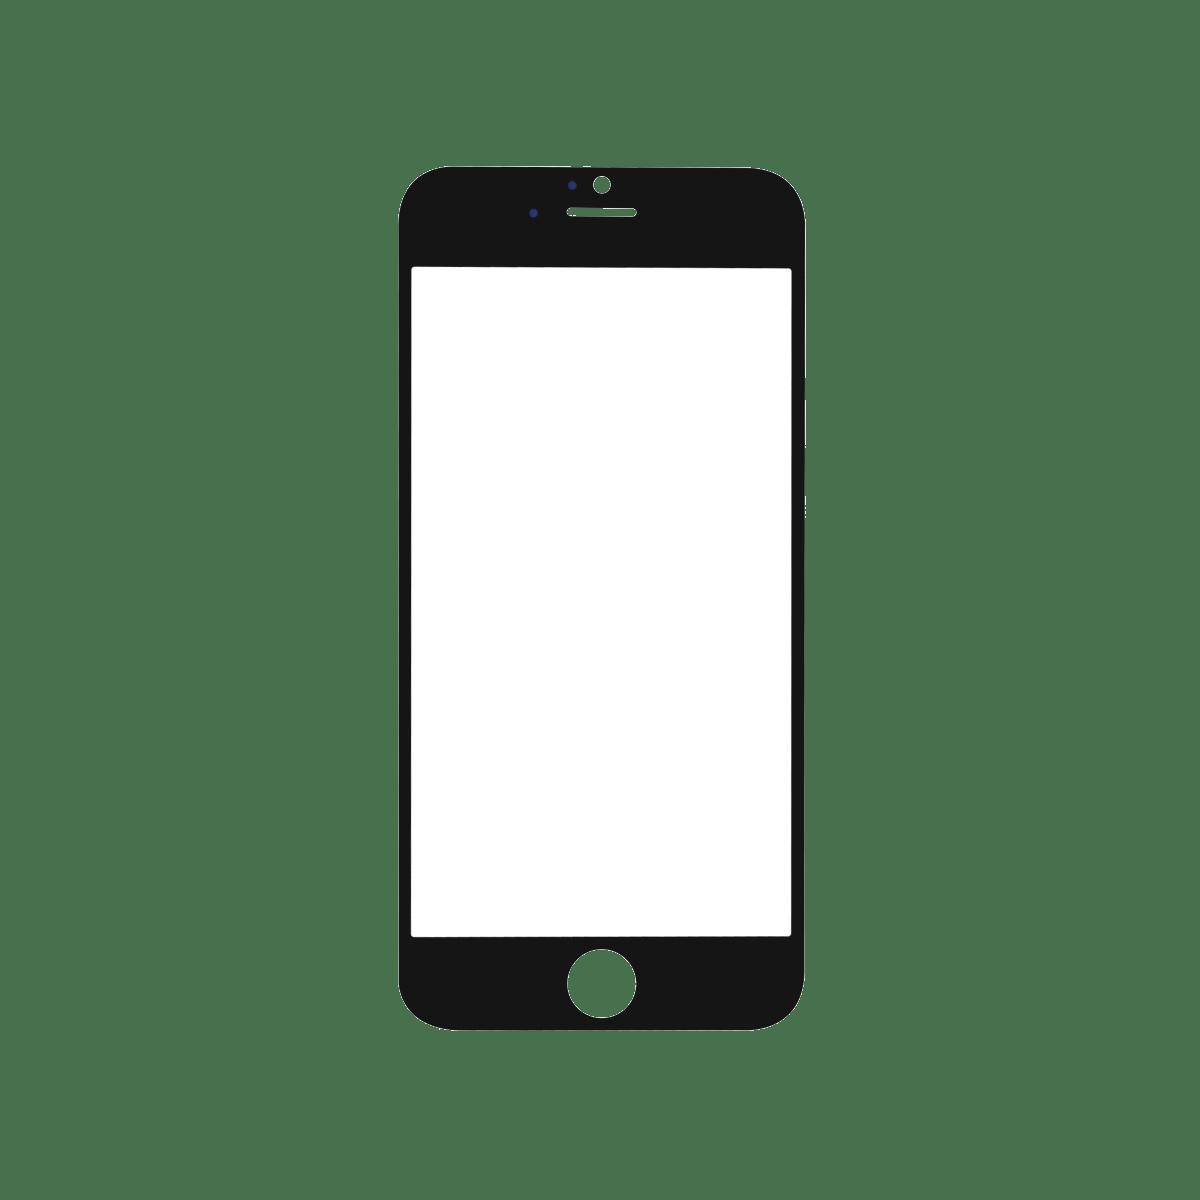 Iphone 6 Oca Optically Clear Adhesive